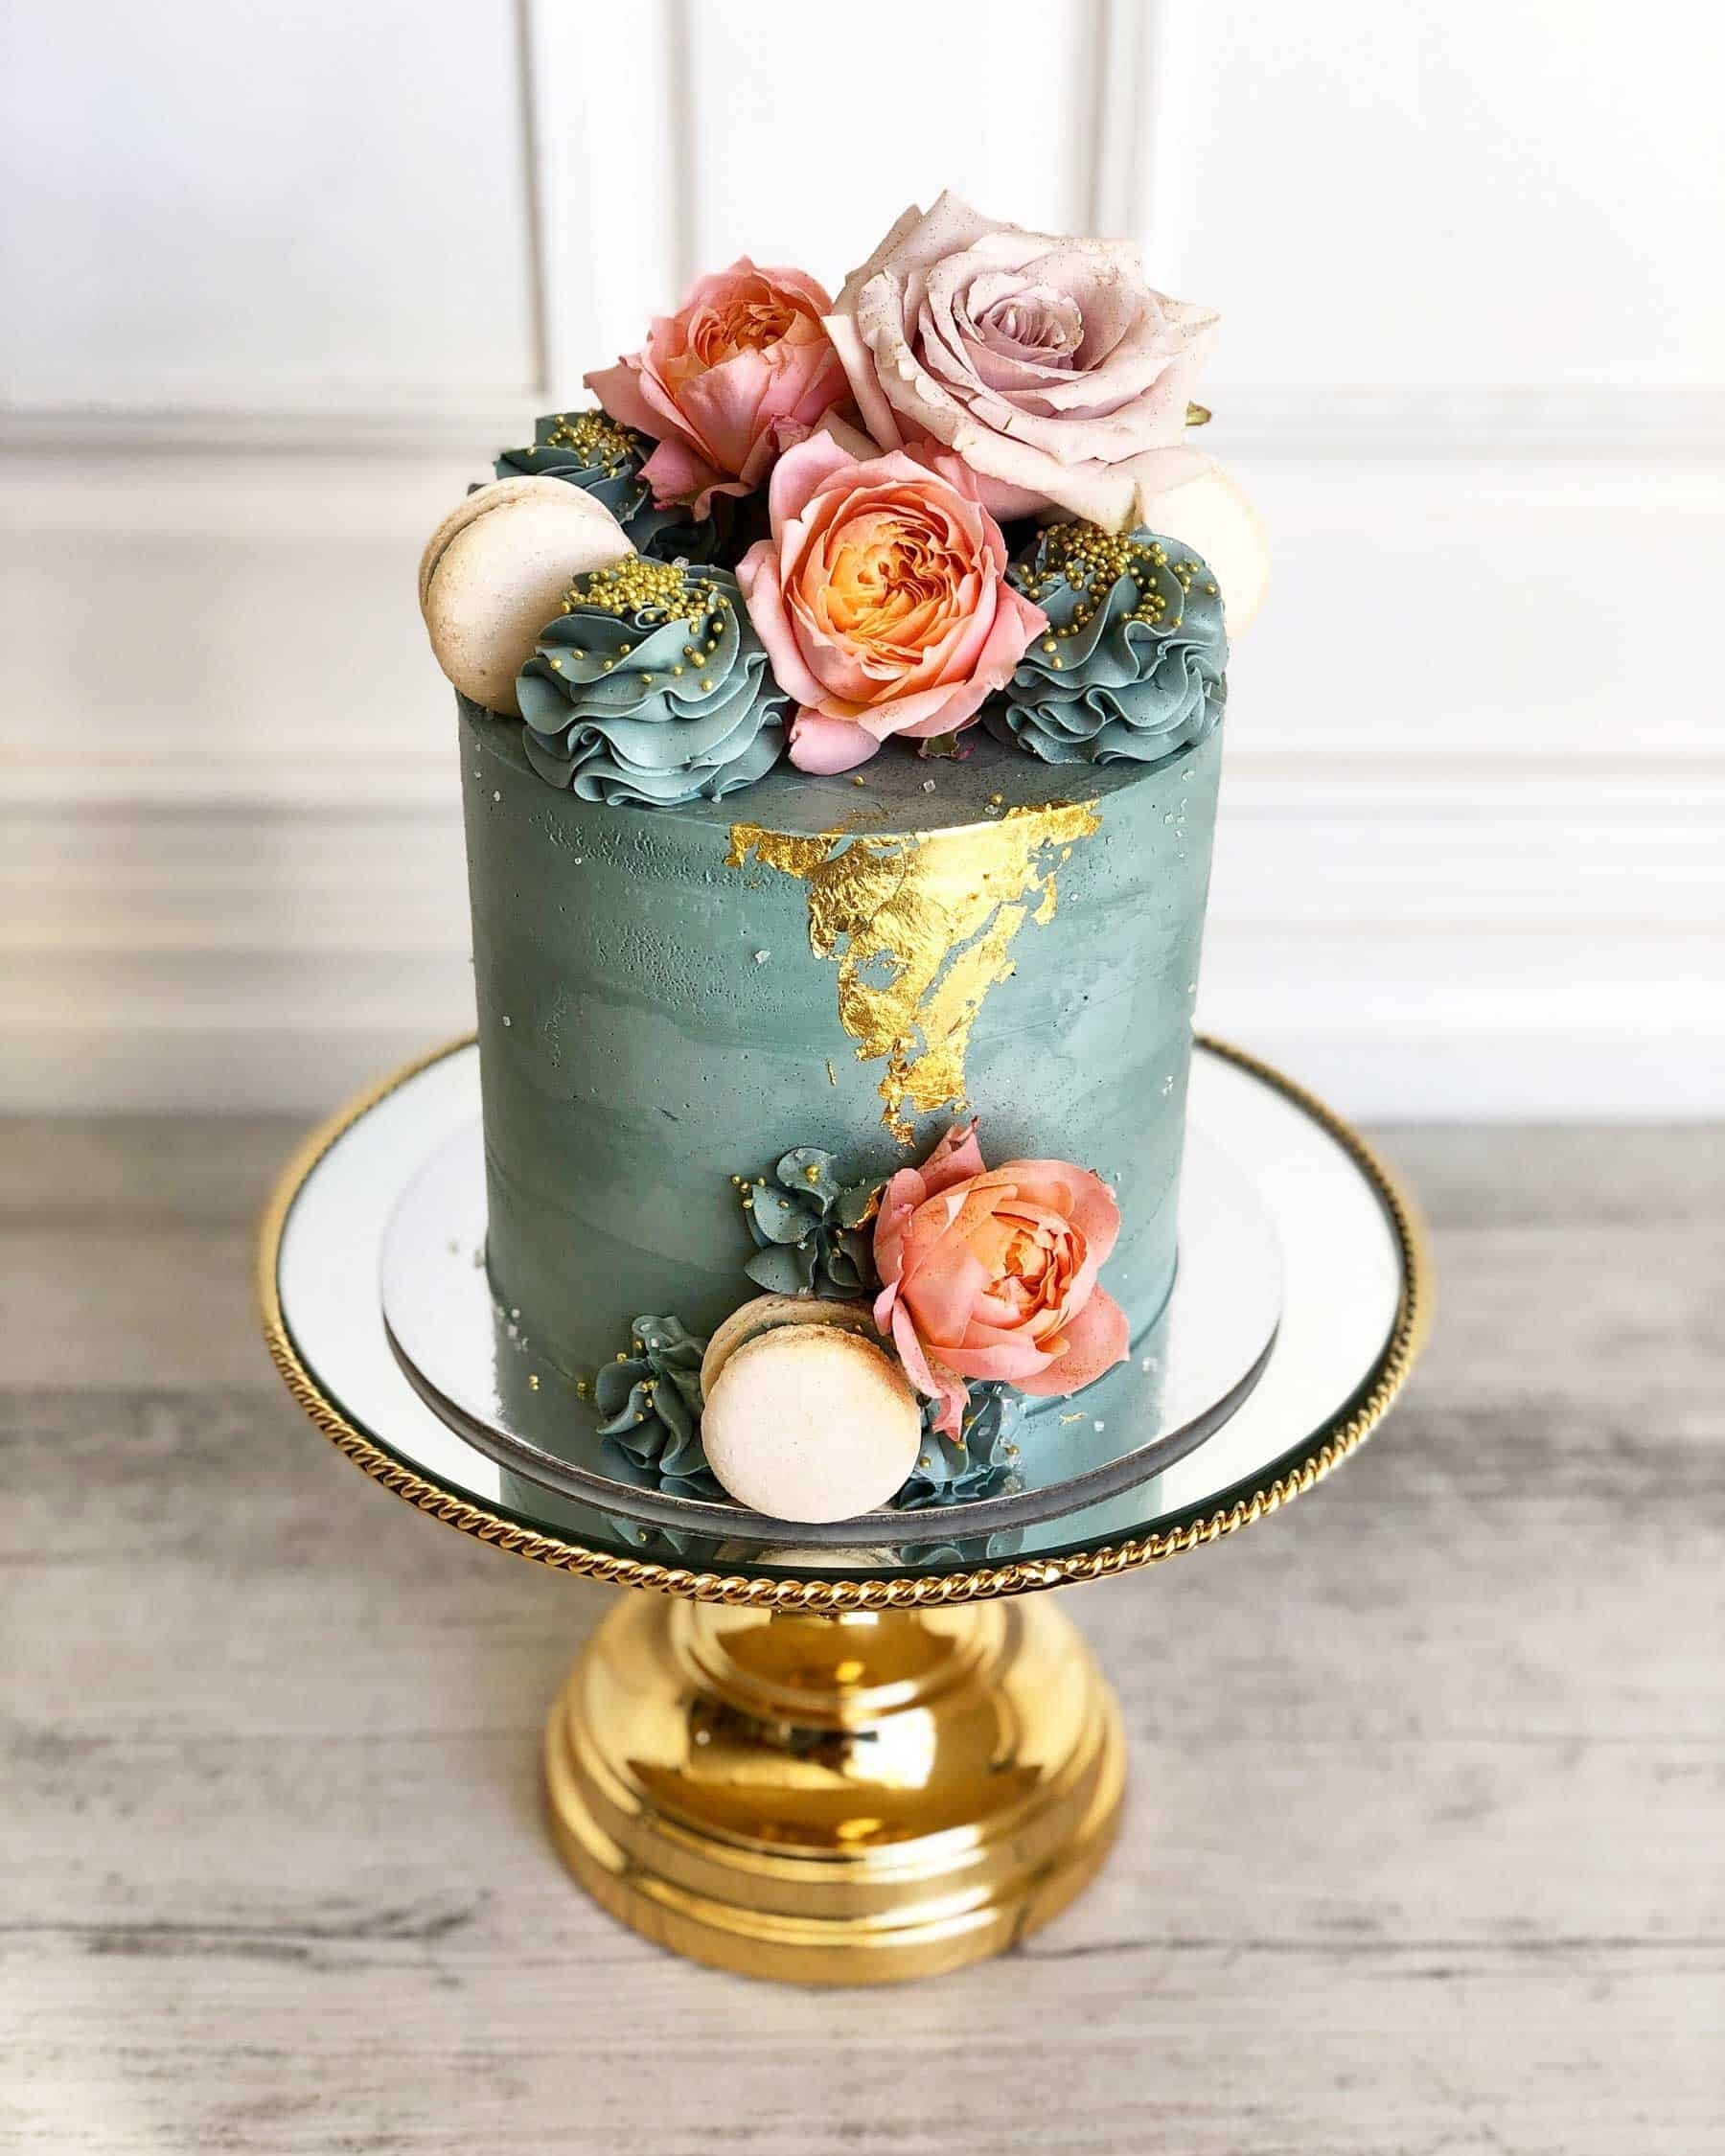 modern and creative wedding cakes in Perth WA - Posh Little Cakes